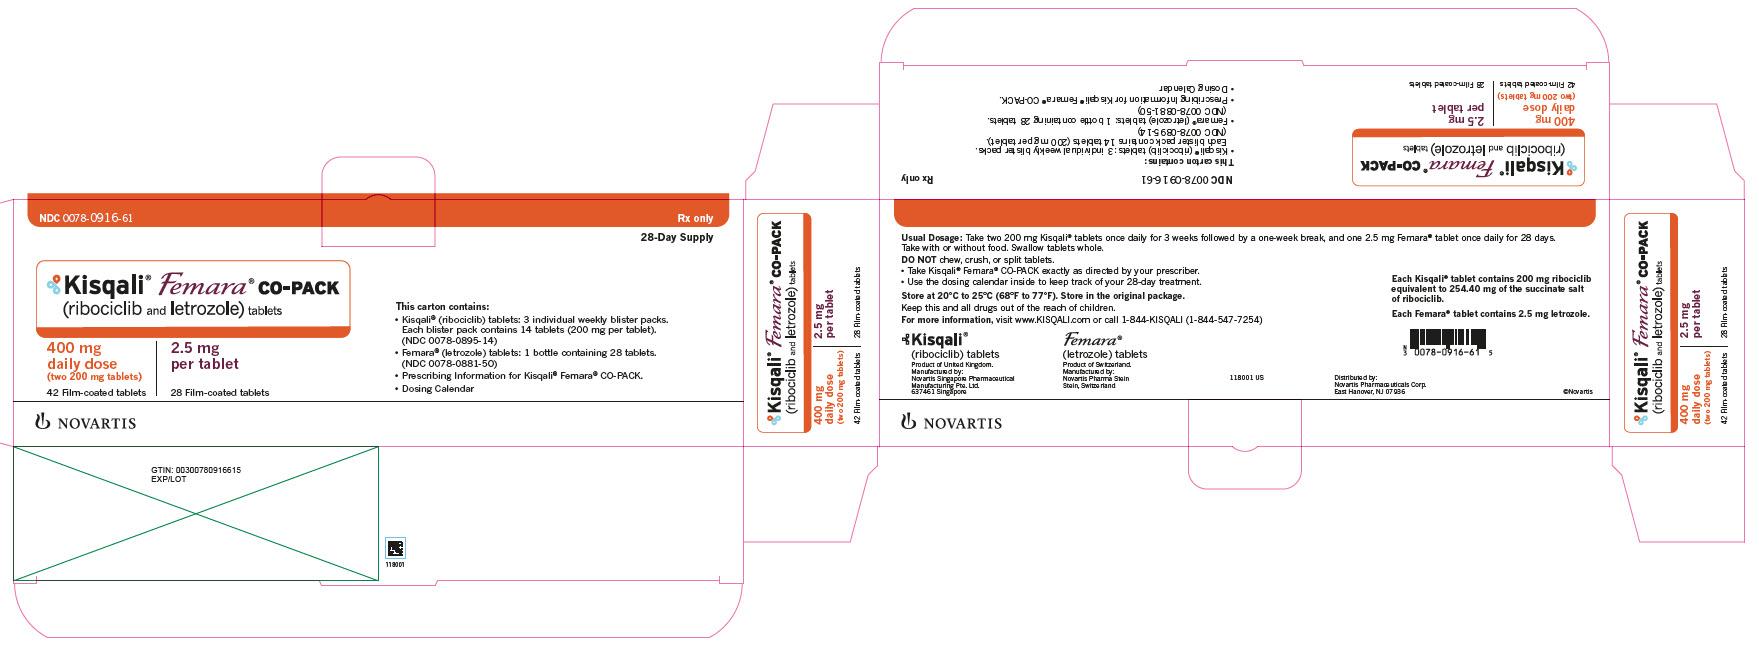 PRINCIPAL DISPLAY PANEL Kisqali Femara CO-PACK (ribociclib and letrozole) tablets 400 mg daily dose (two 200 mg tablets) 42 Film-coated tablets 2.5 mg per tablet 28 Film-coated tablets 28-Day Supply NDC: <a href=/NDC/0078-0916-61>0078-0916-61</a> Rx only